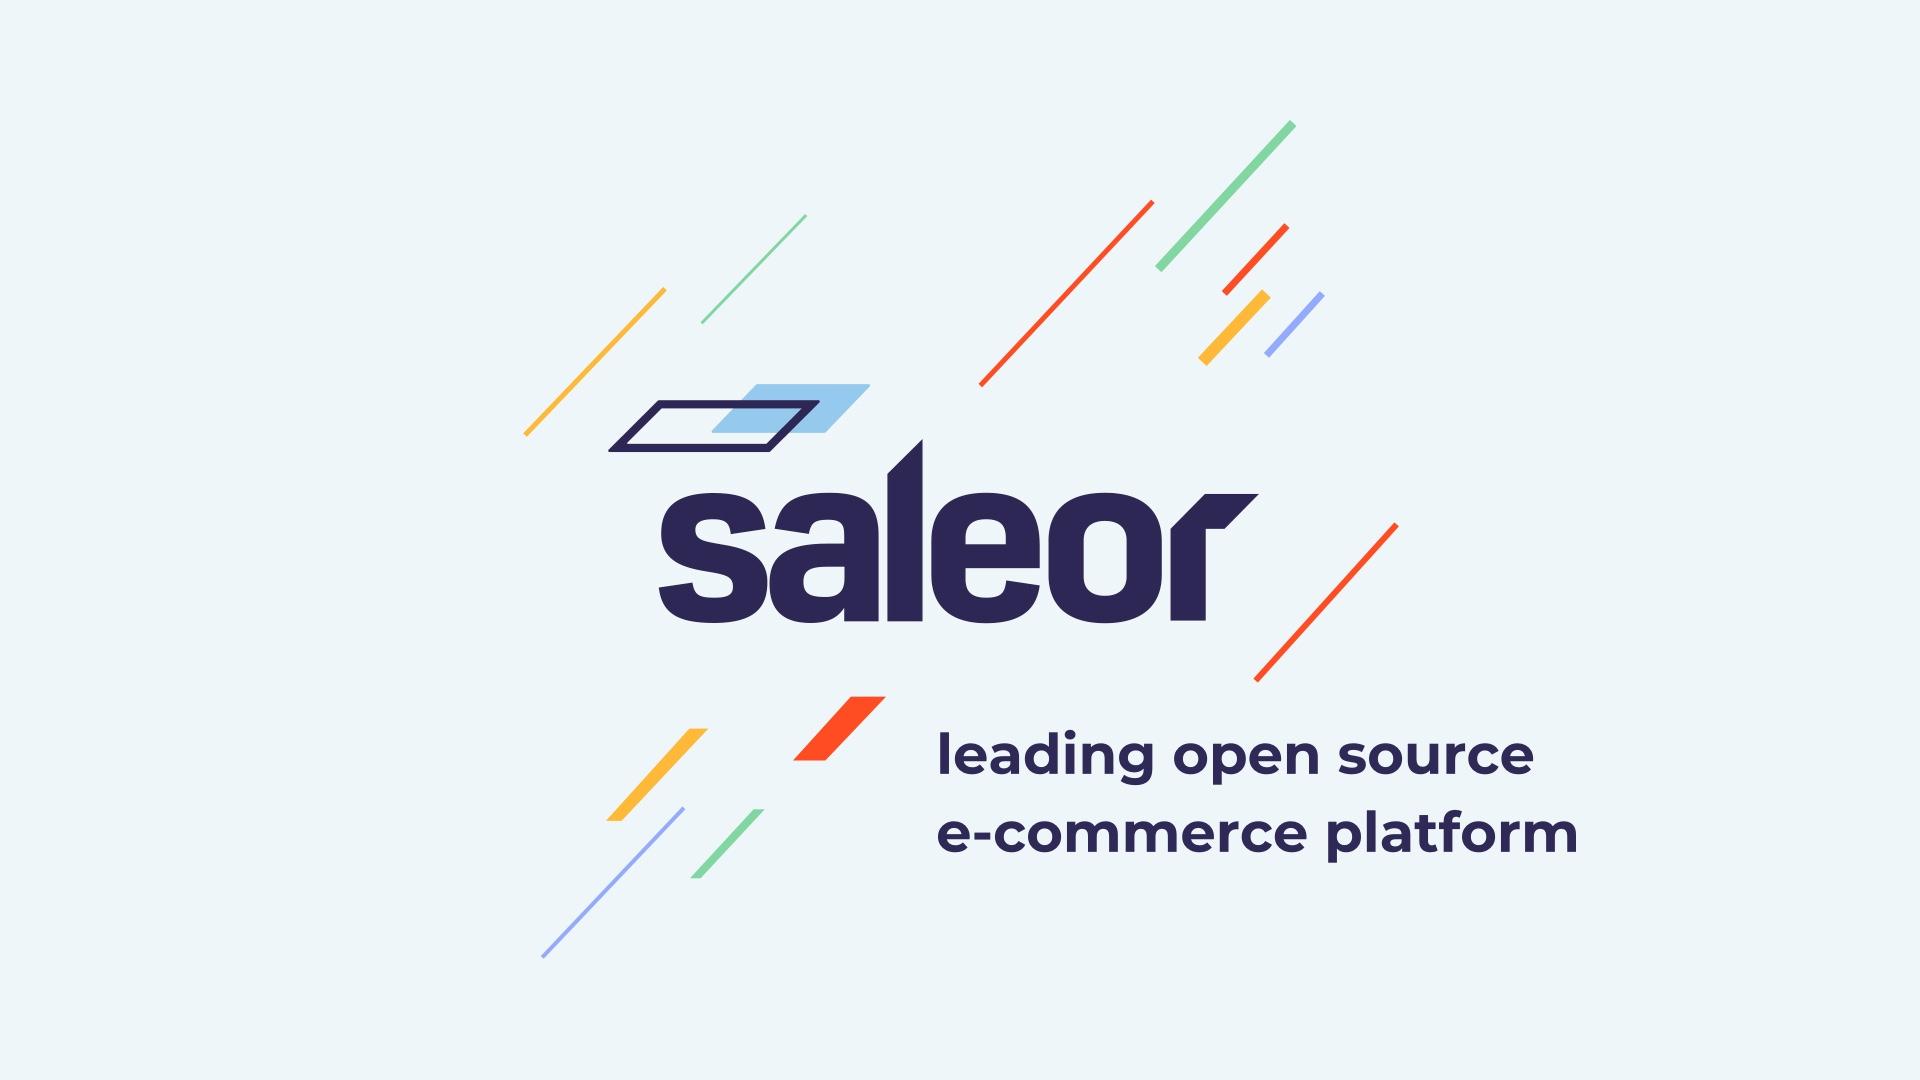 SALEOR – Overview of leading open source e-commerce platform